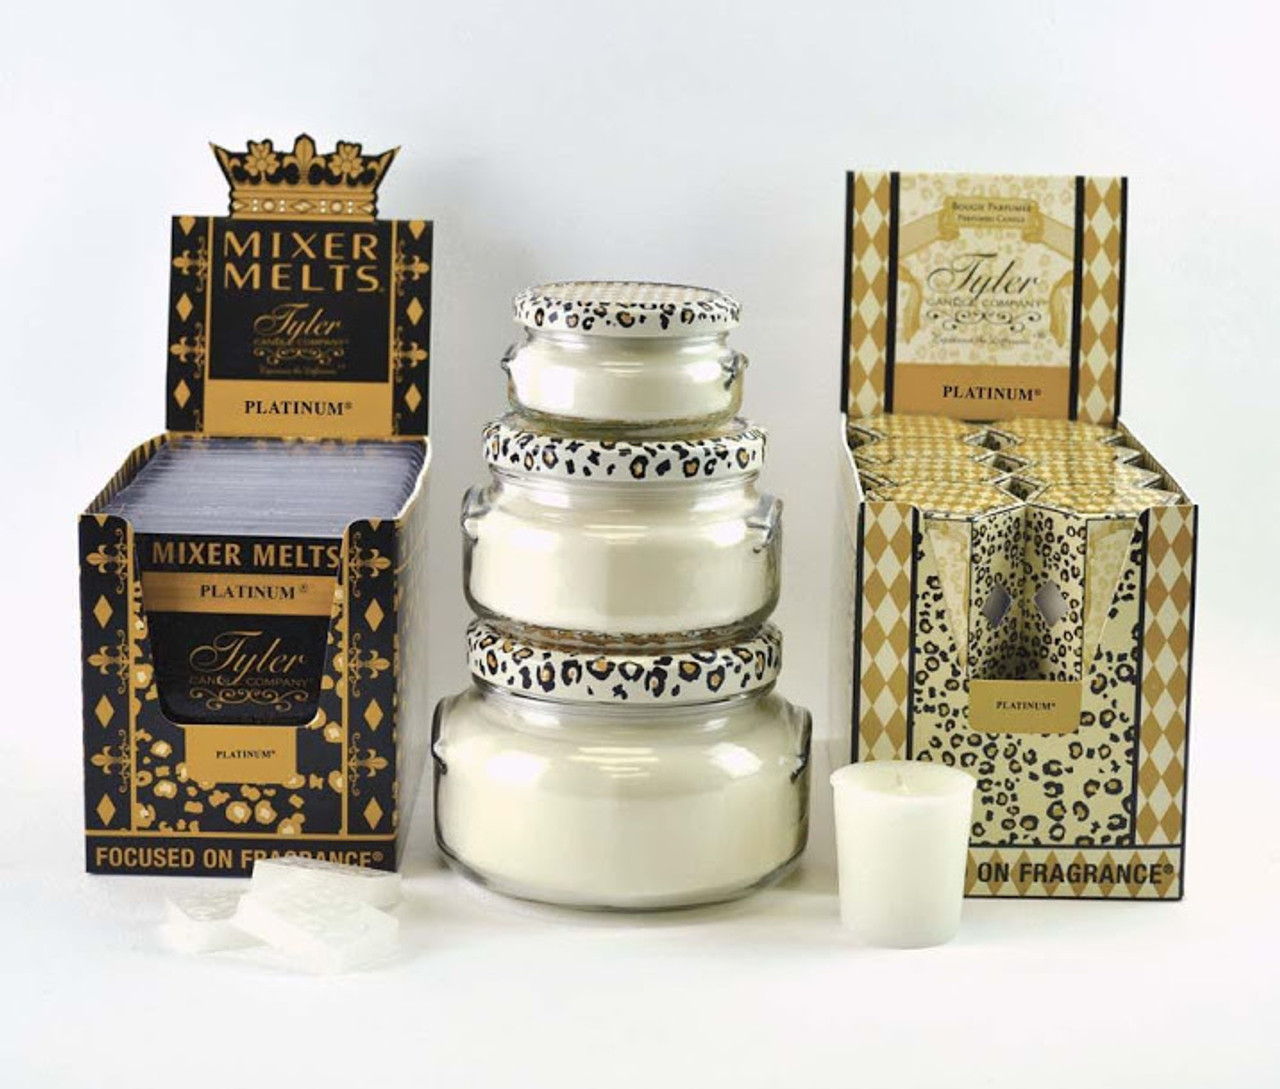 11 oz Platinum Candle Tyler Candle Company